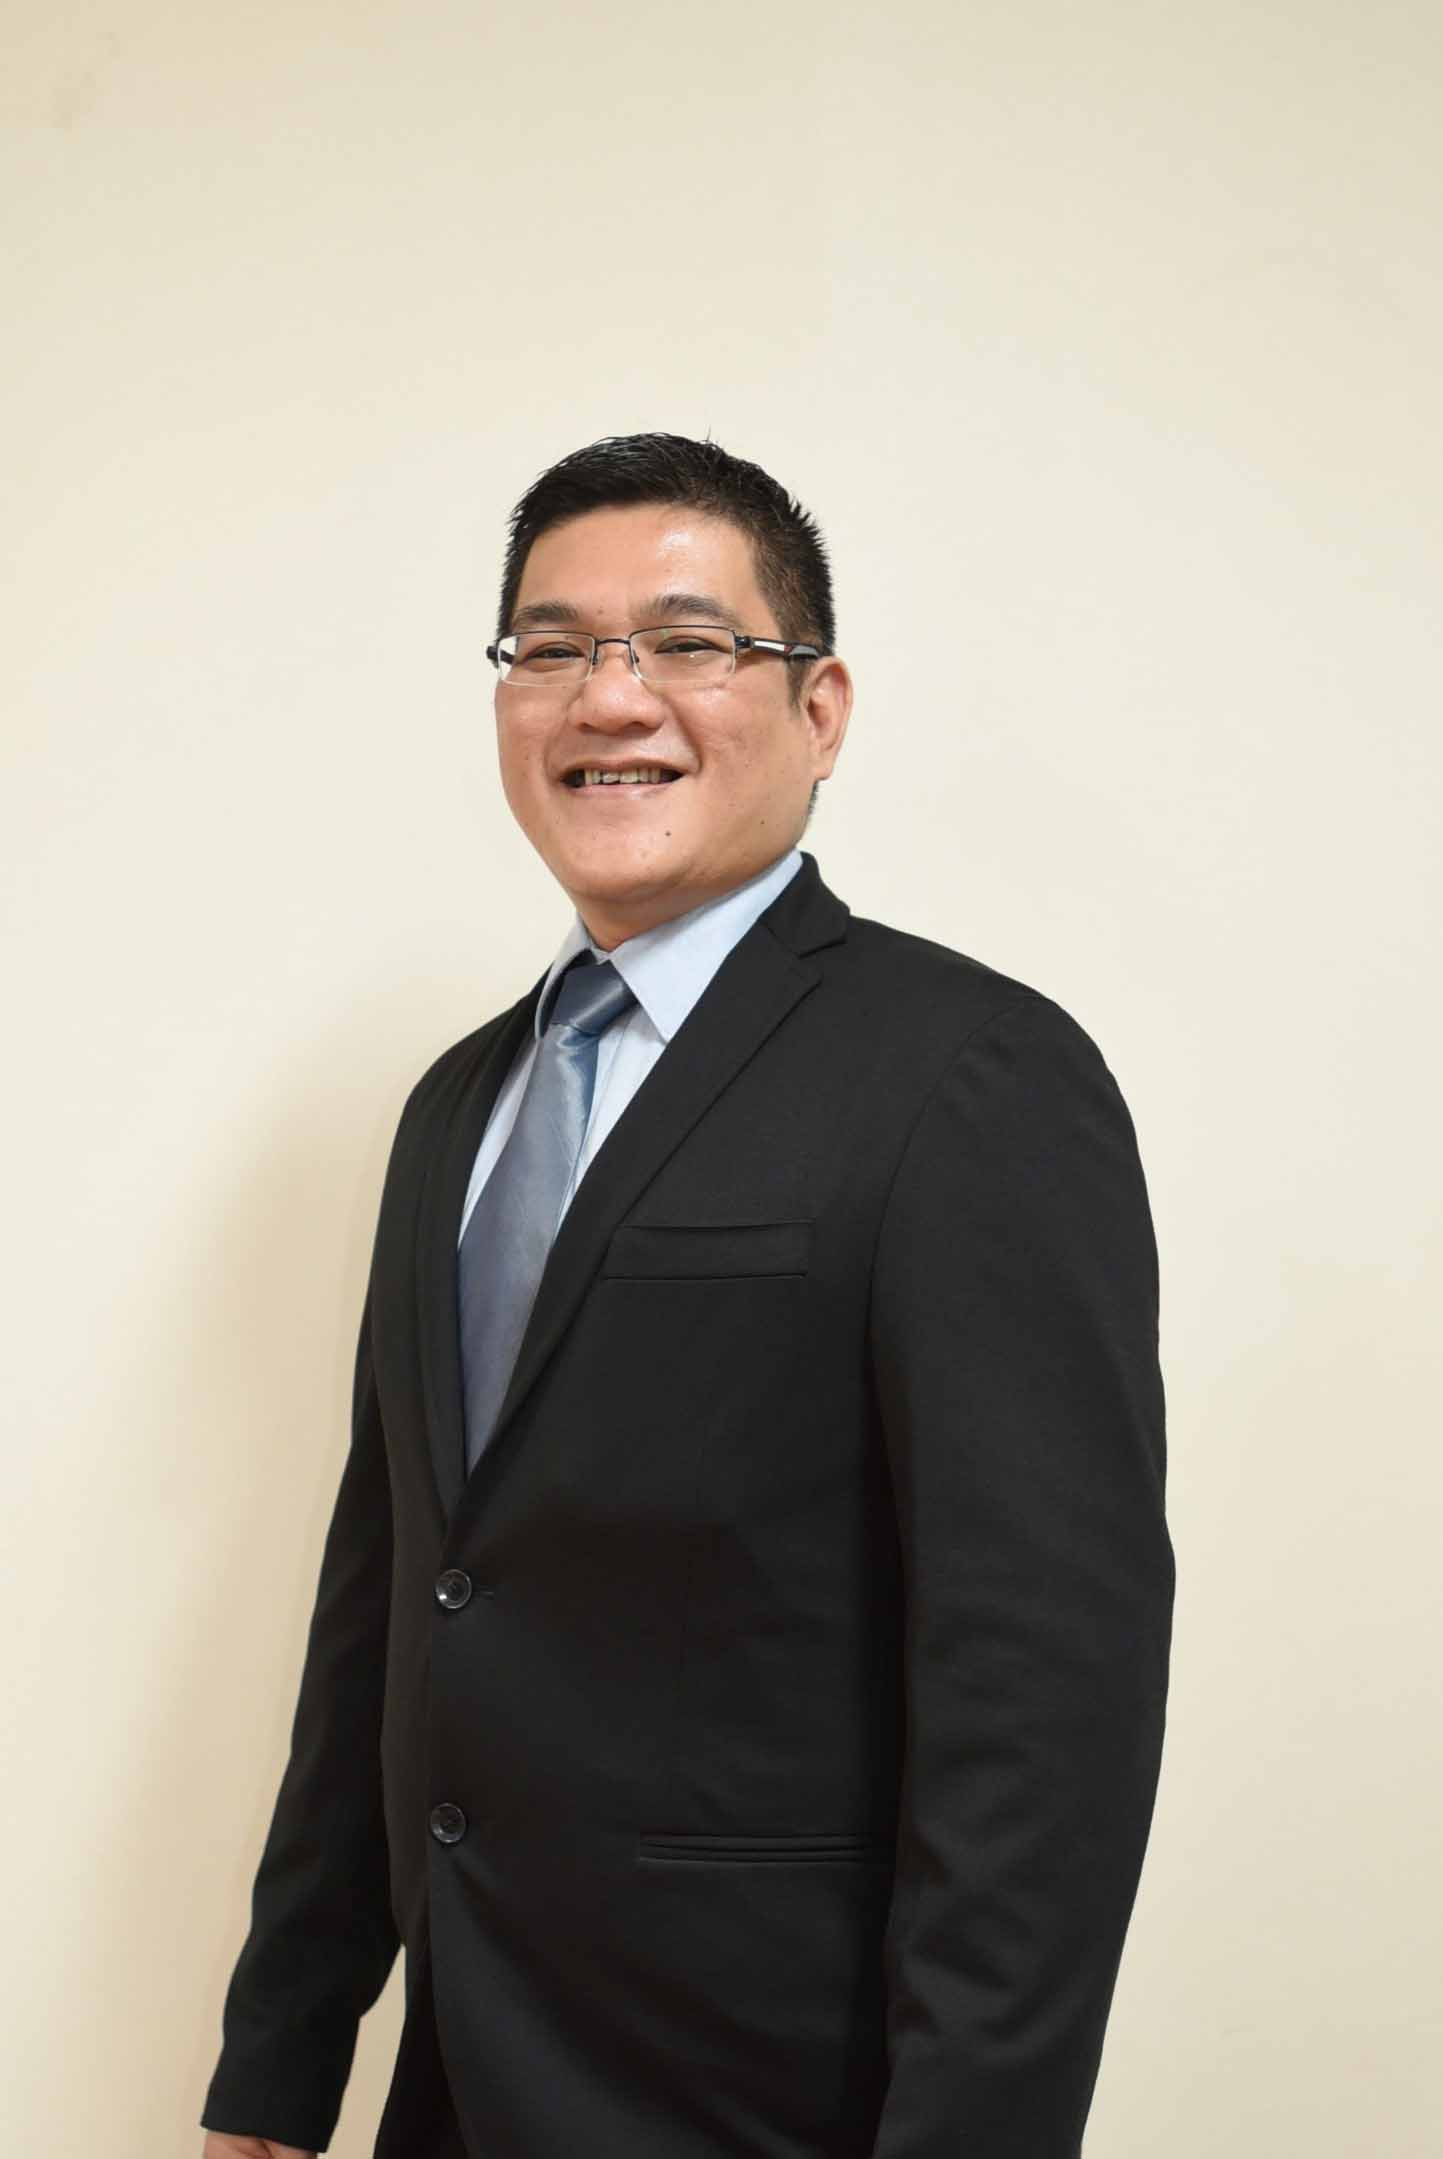 Mr Gunawan Sutanto